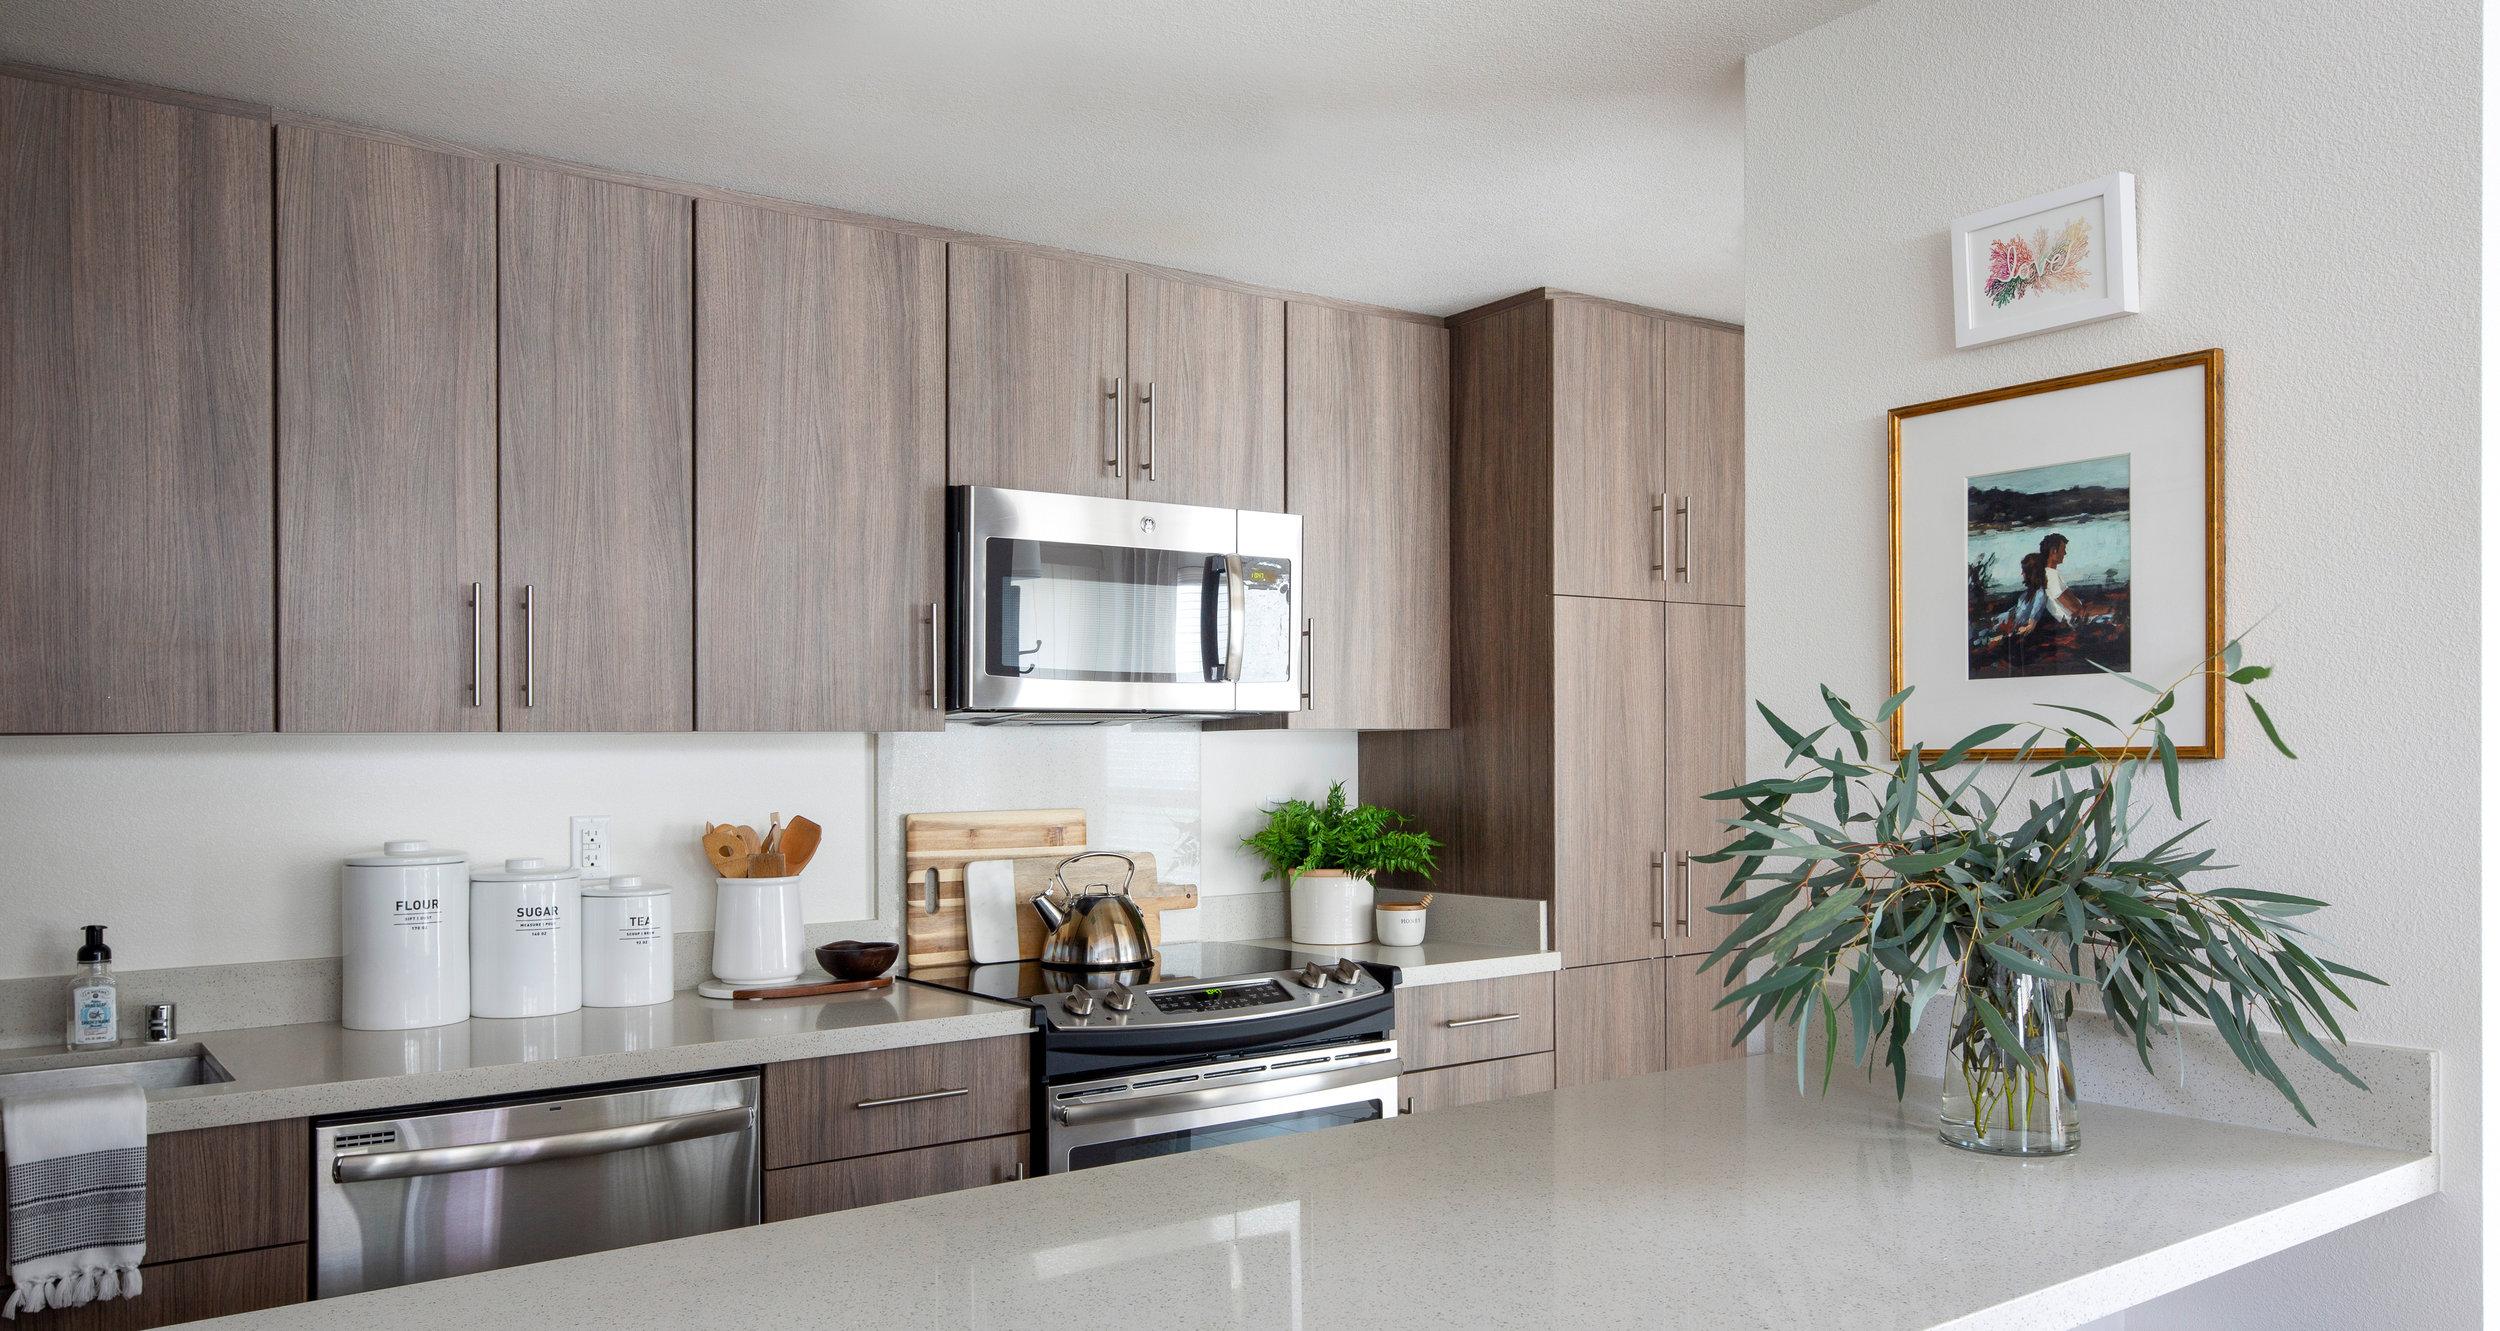 Kailua-Condo-Kitchen-Island-Cabinets.jpg